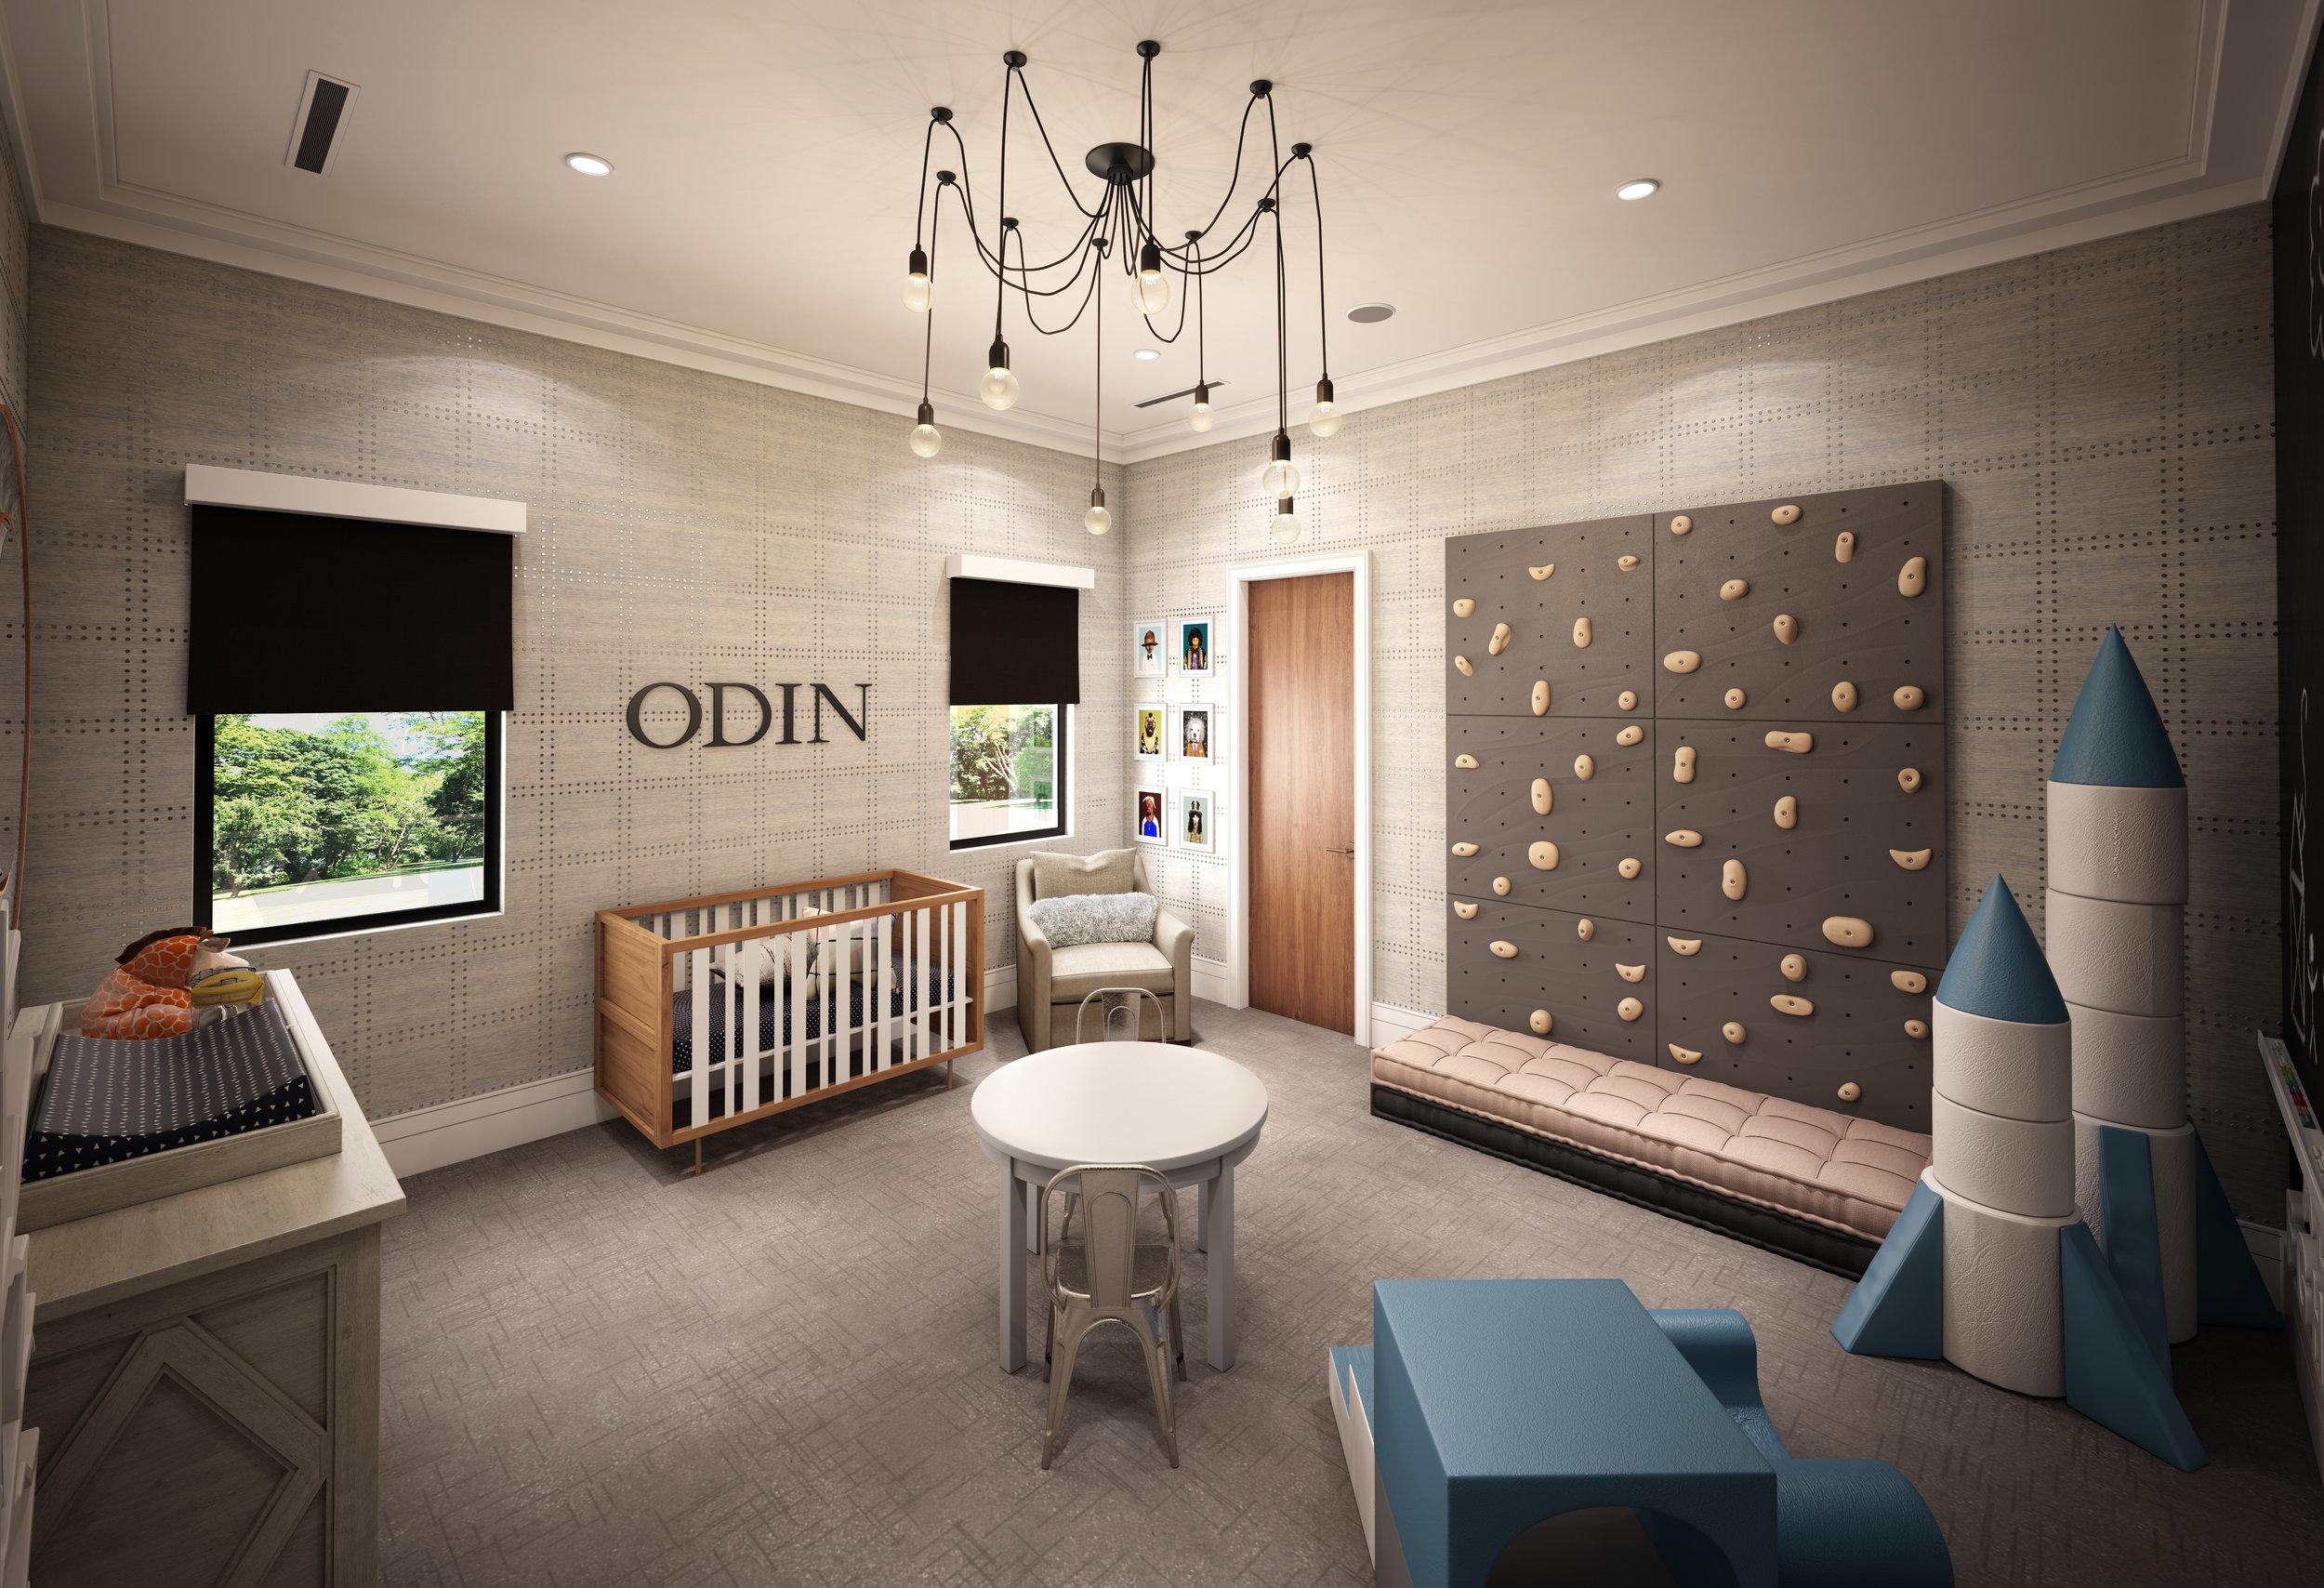 Odin's Room